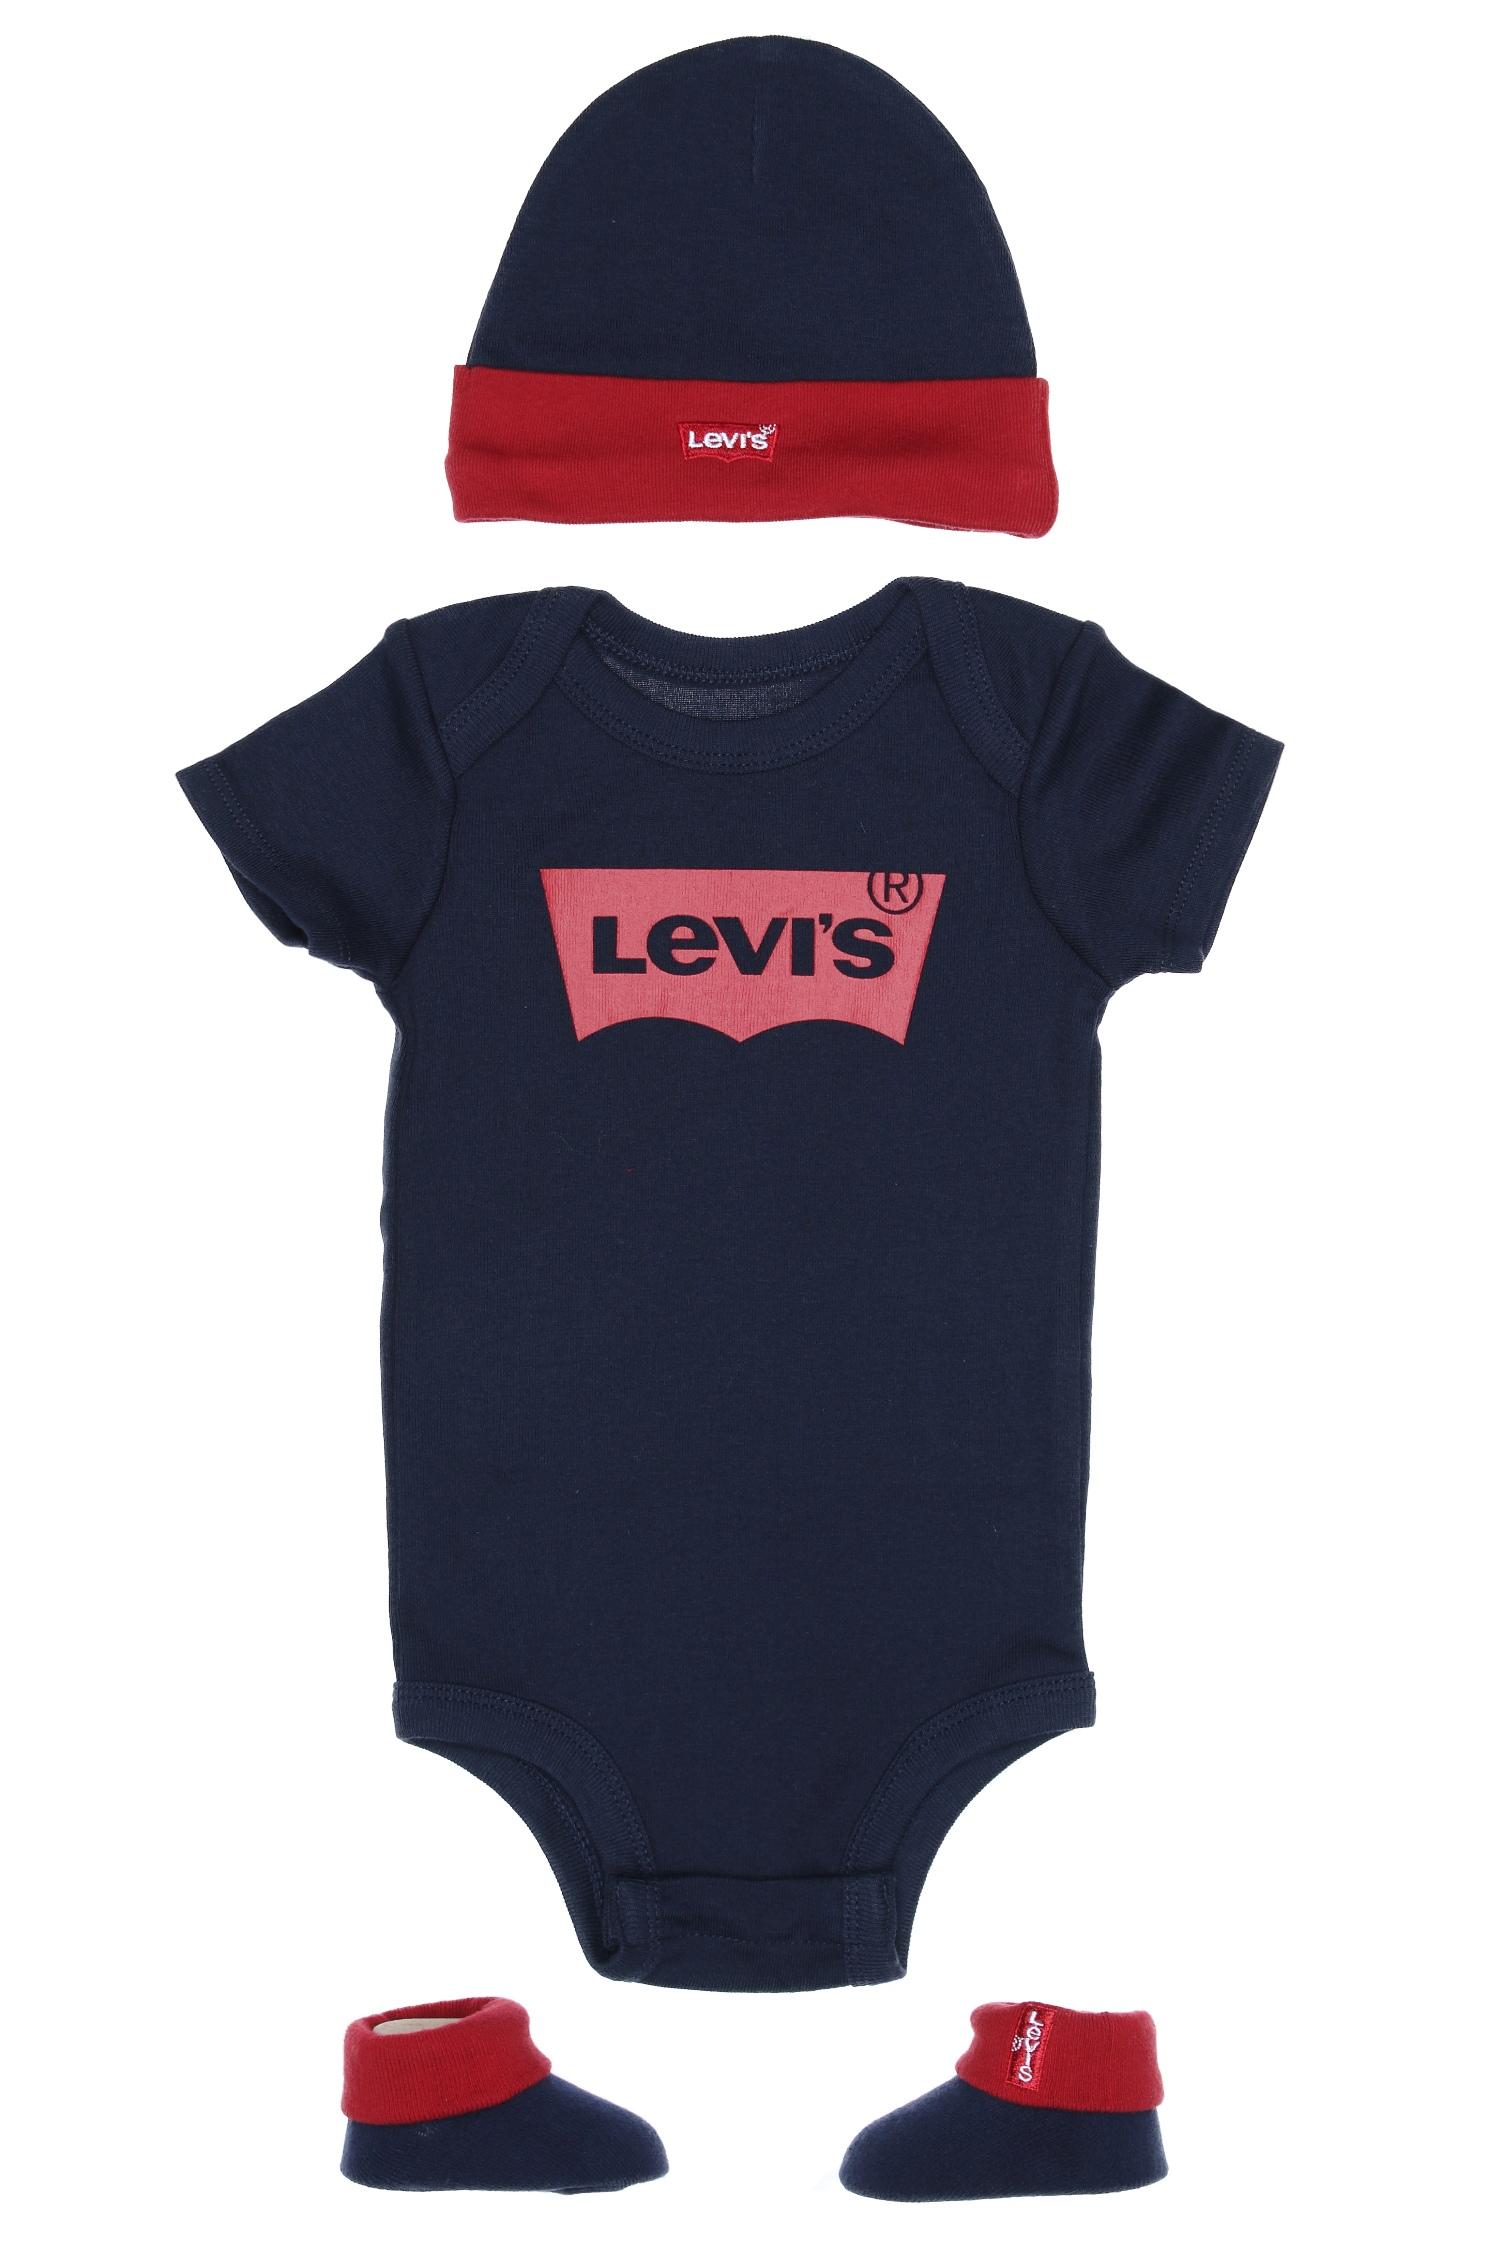 https://www.leadermode.com/188892/levi-s-kids-0019-u09-dress-blue.jpg